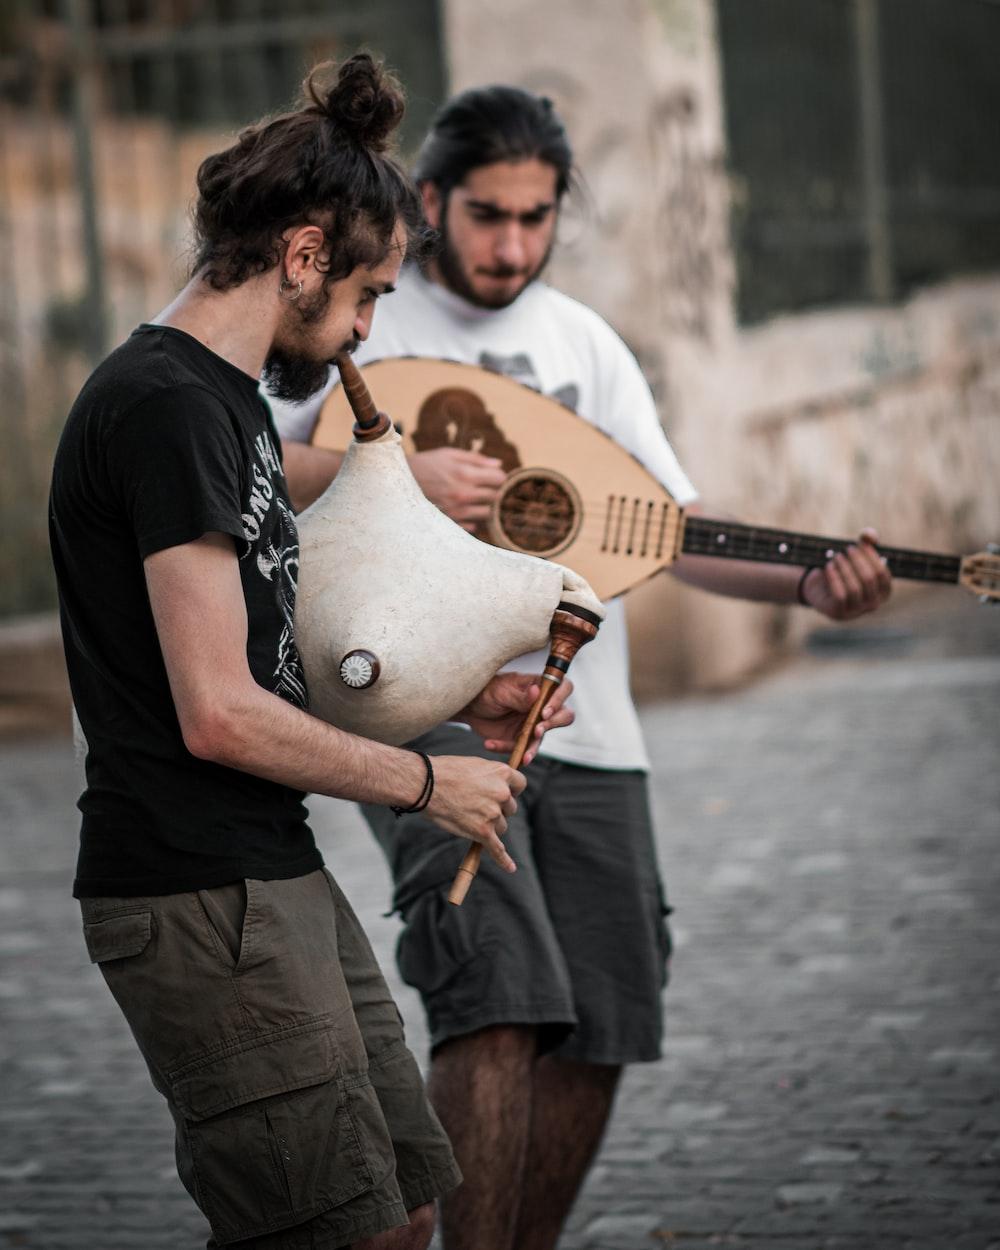 man in black t-shirt playing acoustic guitar